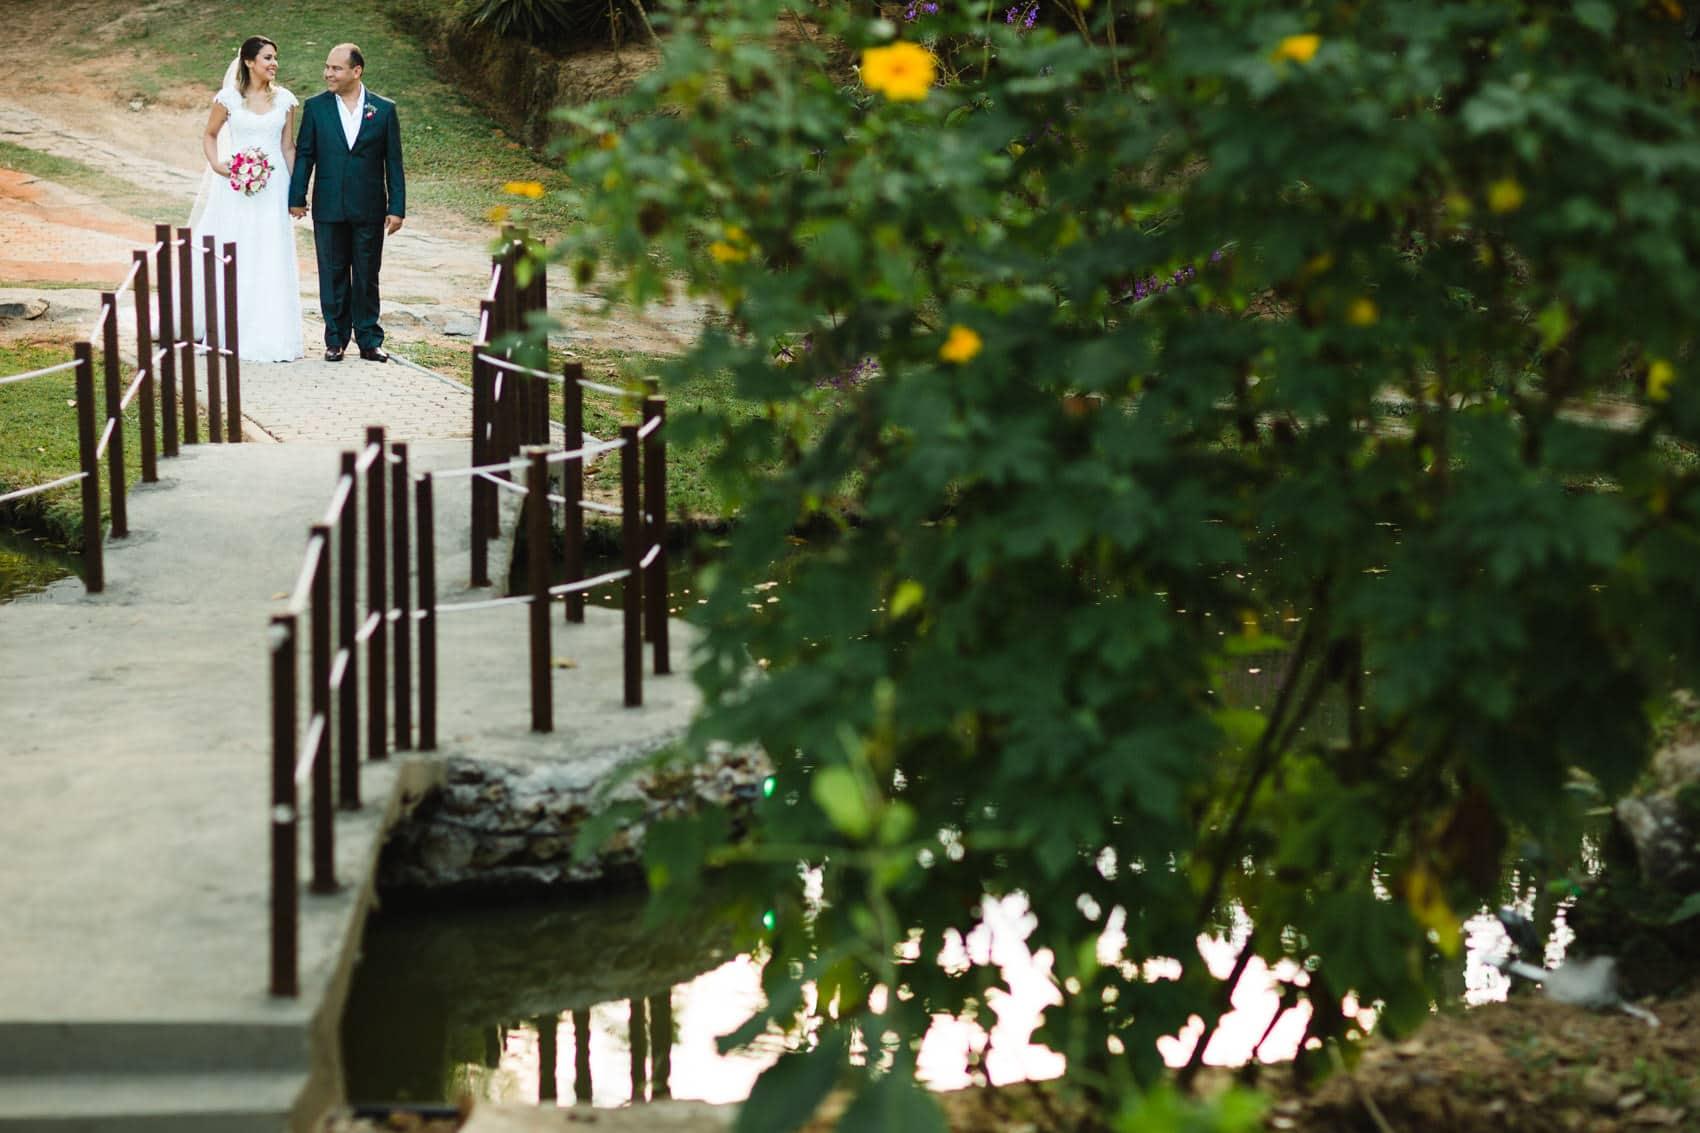 casamento-sitio-serra-guaramiranga-26